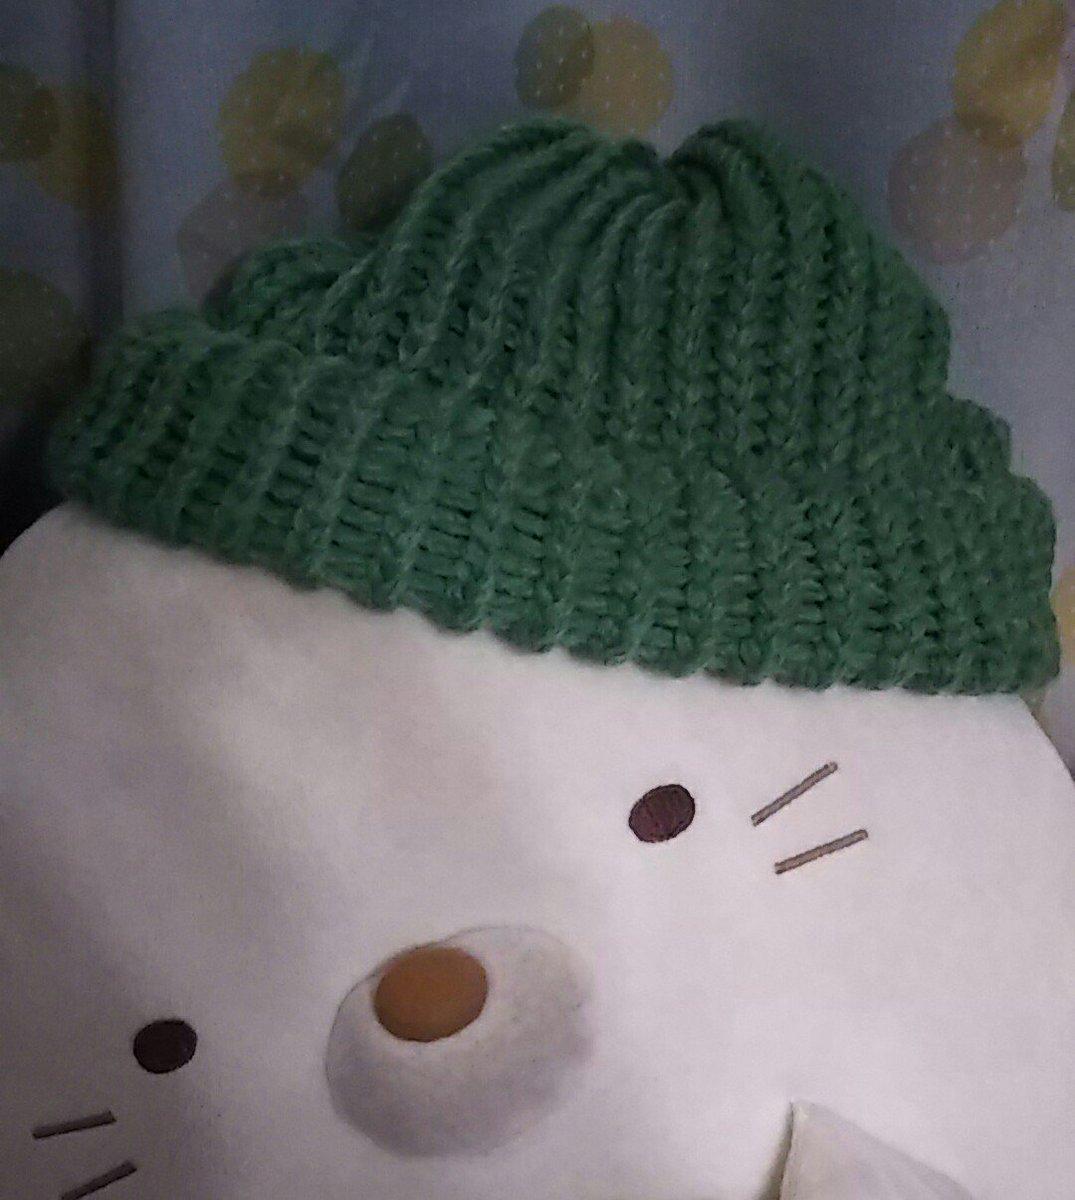 test ツイッターメディア - 試作品出来っ! #Seria で編み機と毛糸買って作ってみた?( 'ω' )?  改良の余地アリだけど思ったよりキレイに編めたー♪ 気分転換の良い暇つぶし(o´艸`) https://t.co/dZZb7TAWCS